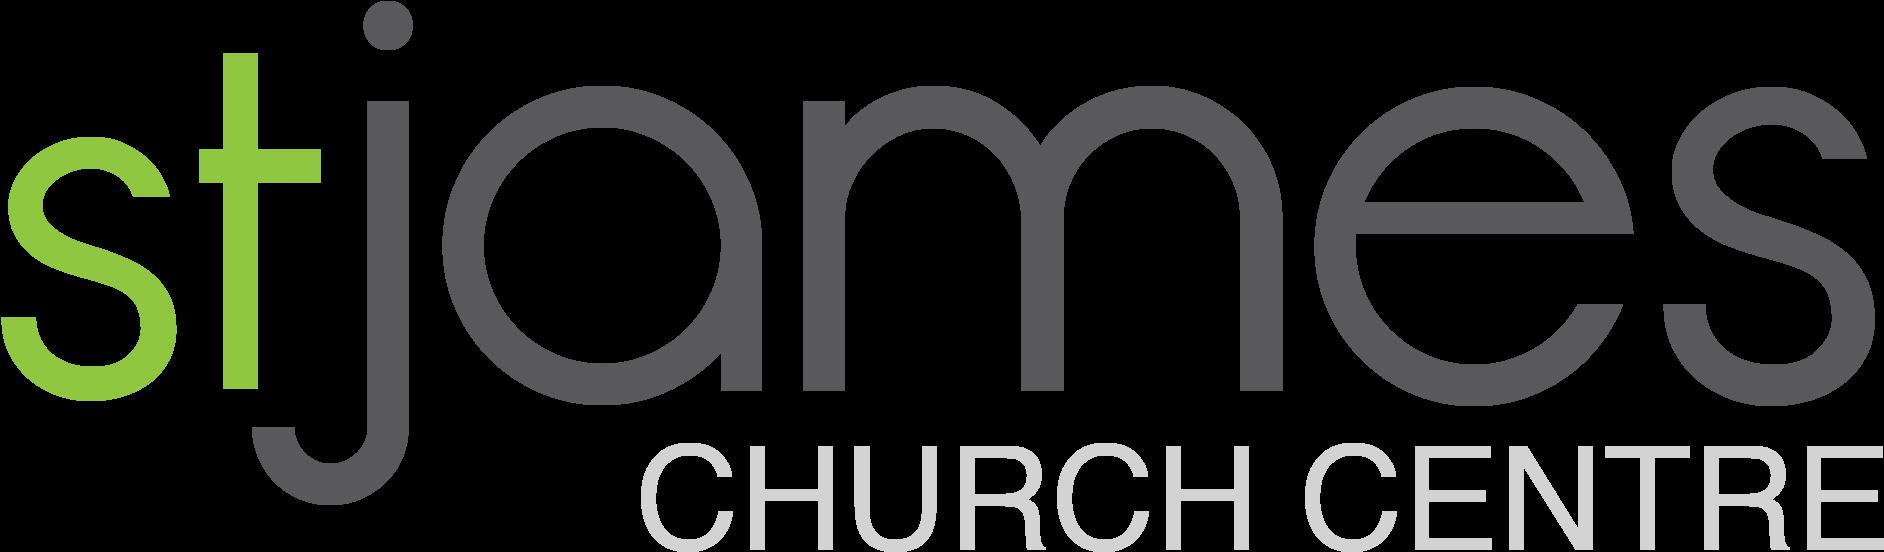 Operation Christmas Child Logo Transparent Background.Download Operation Christmas Child 2017 St James Woodley